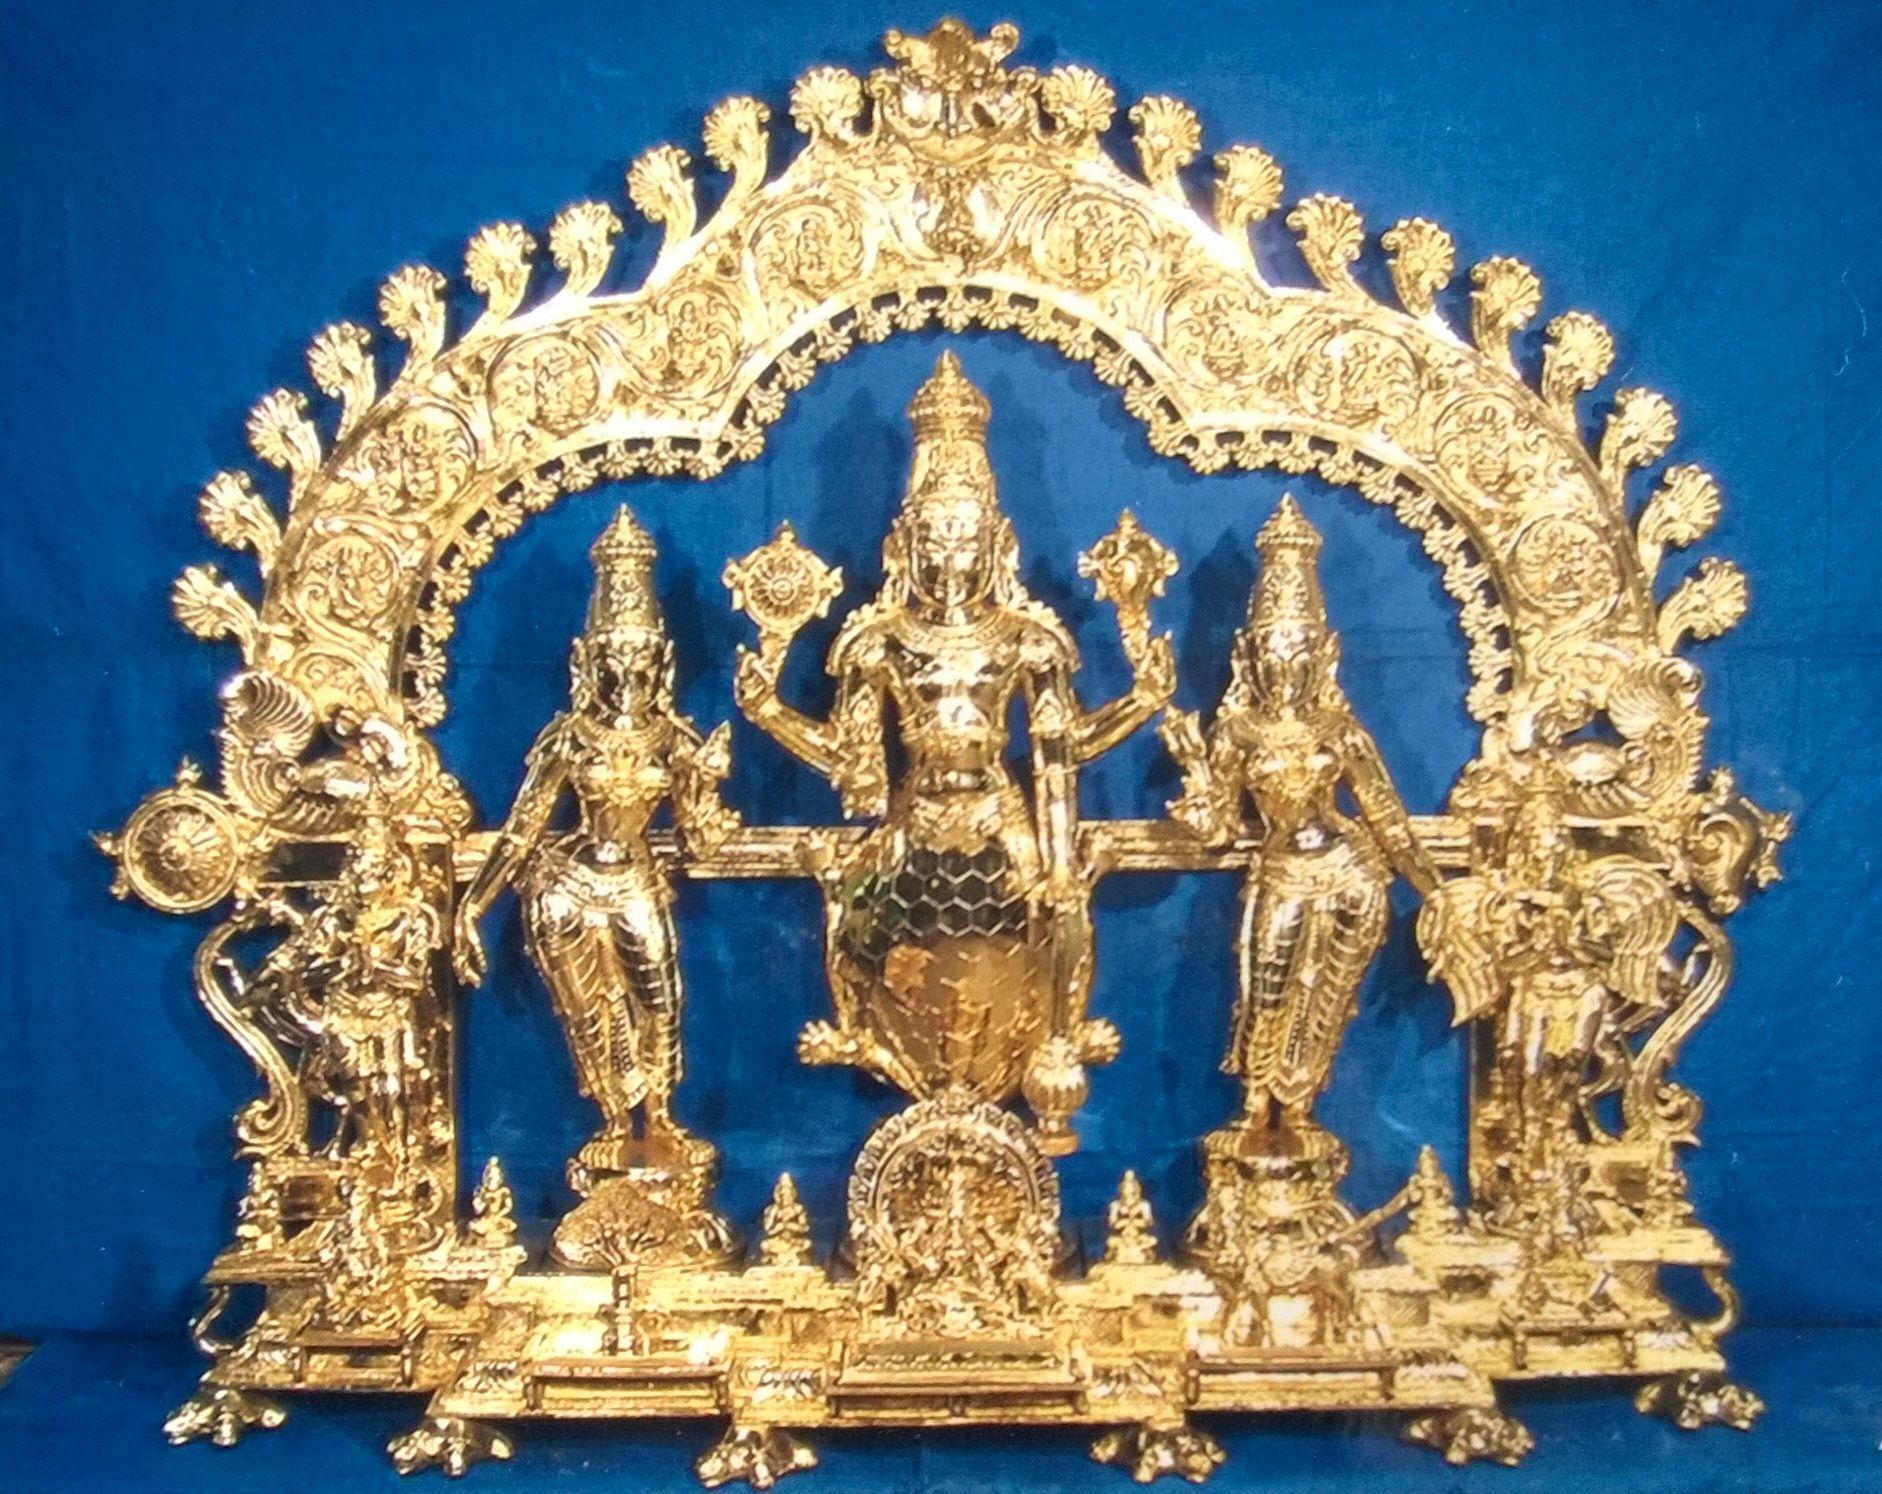 Lord Vishnu incarnated Kurma Avatar. Kurma (Tortoise